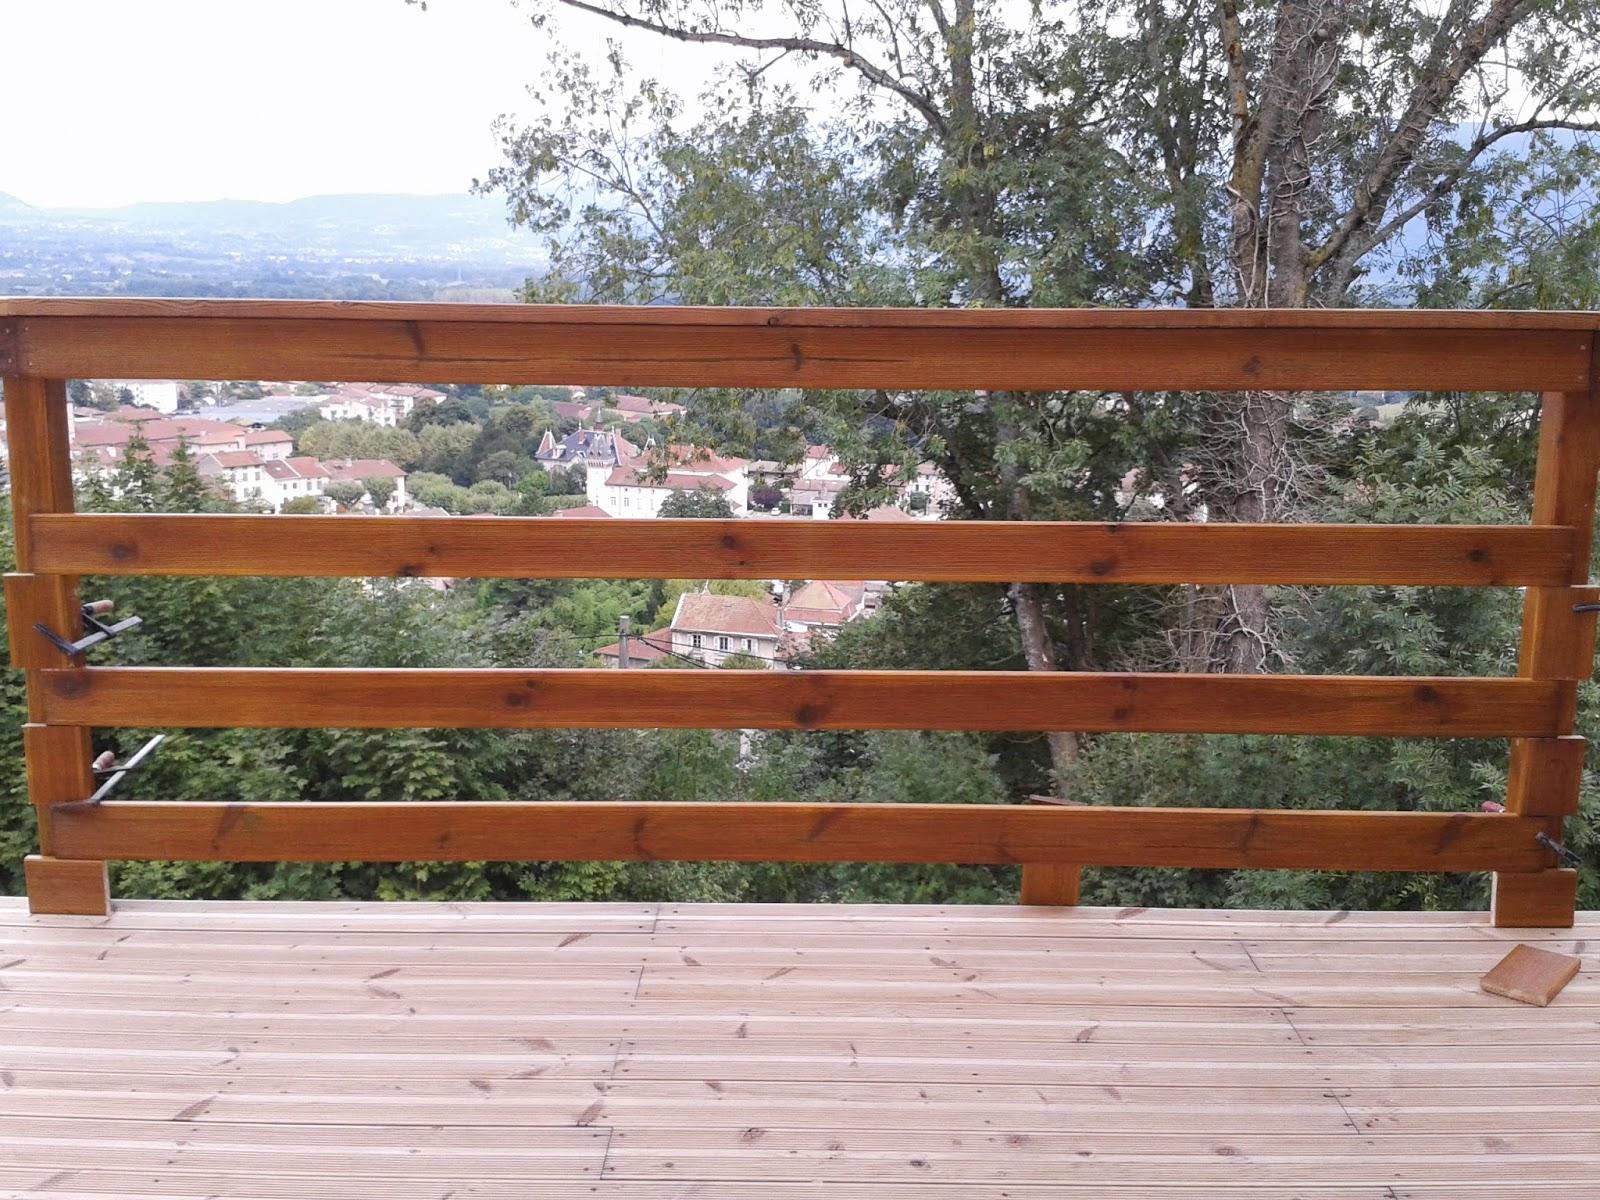 notre nid au paradis barri re de la terrasse. Black Bedroom Furniture Sets. Home Design Ideas